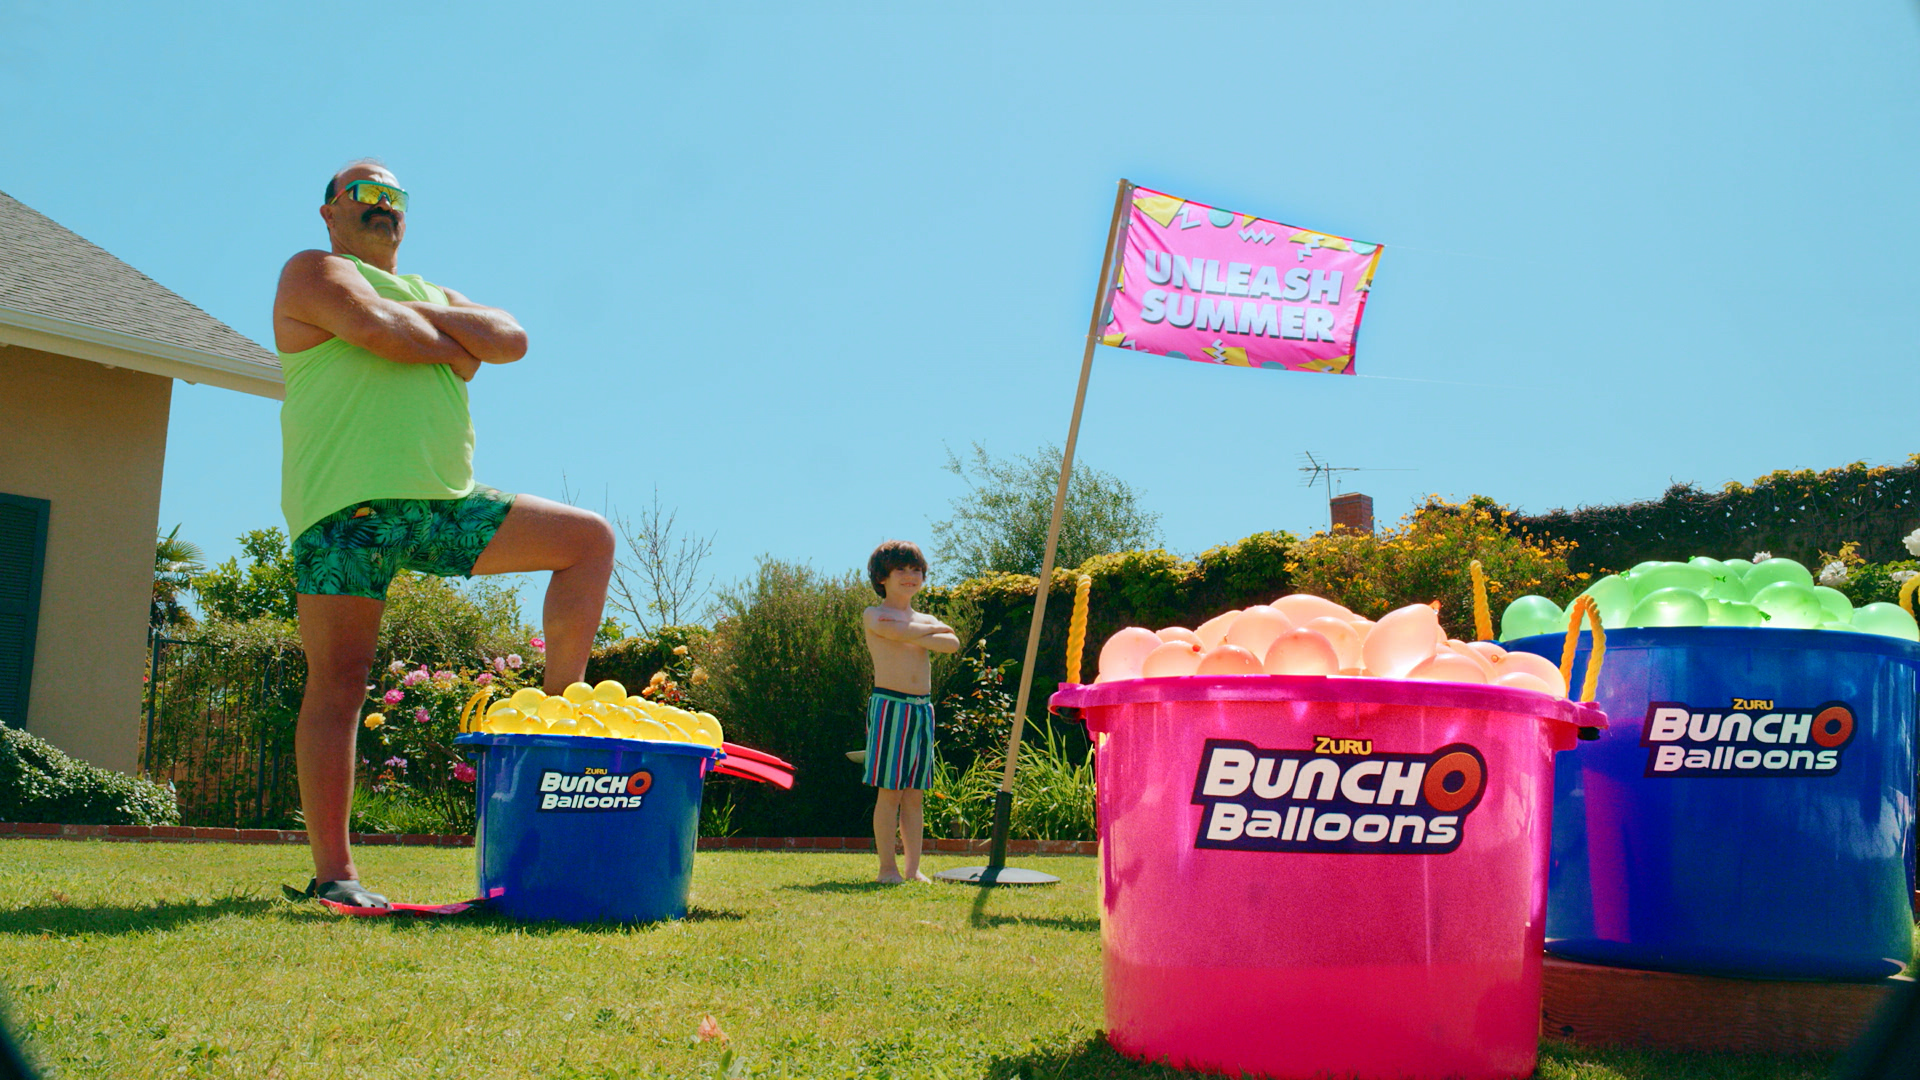 Unleash Summer - Commercial // Bunch O' Balloons